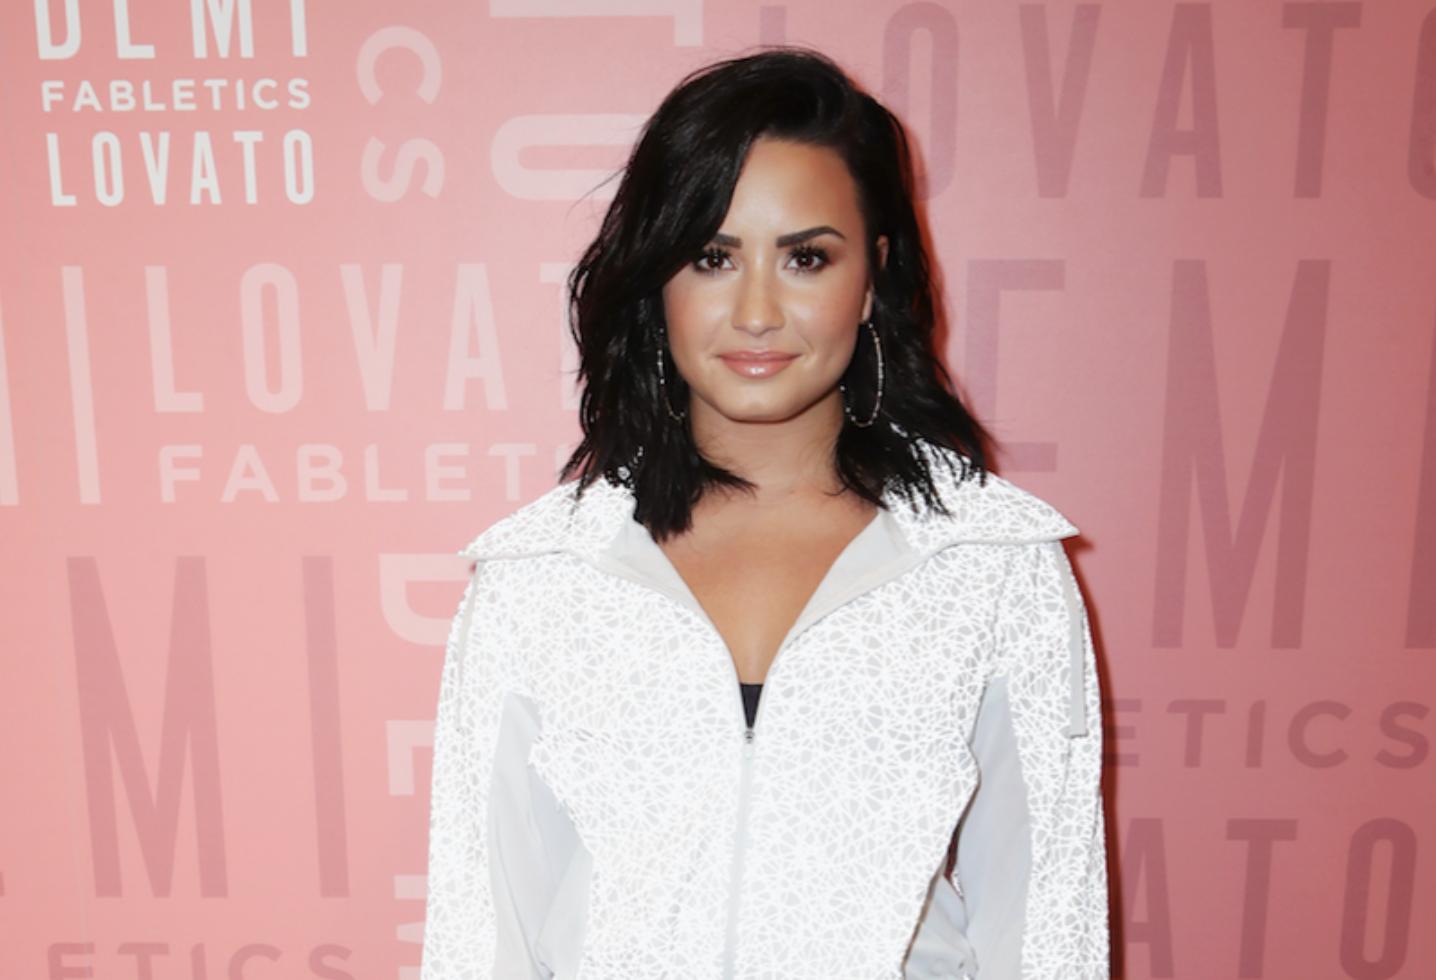 Demi Lovato Unfollows Selena Gomez on Instagram